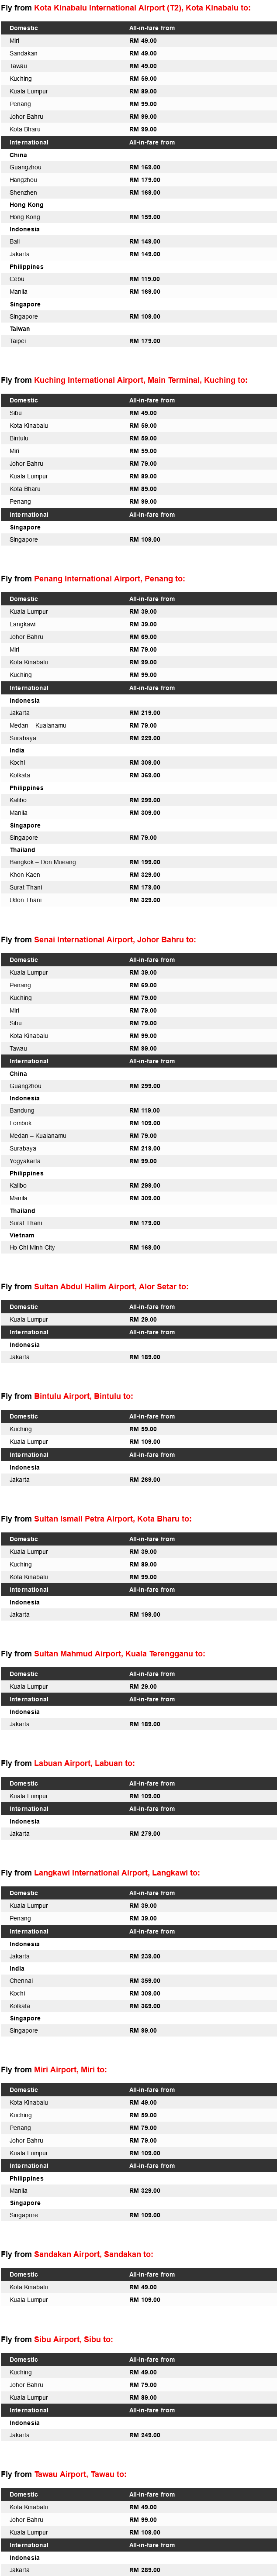 AirAsia Explore Exciting Destinations With Low Fares Promo